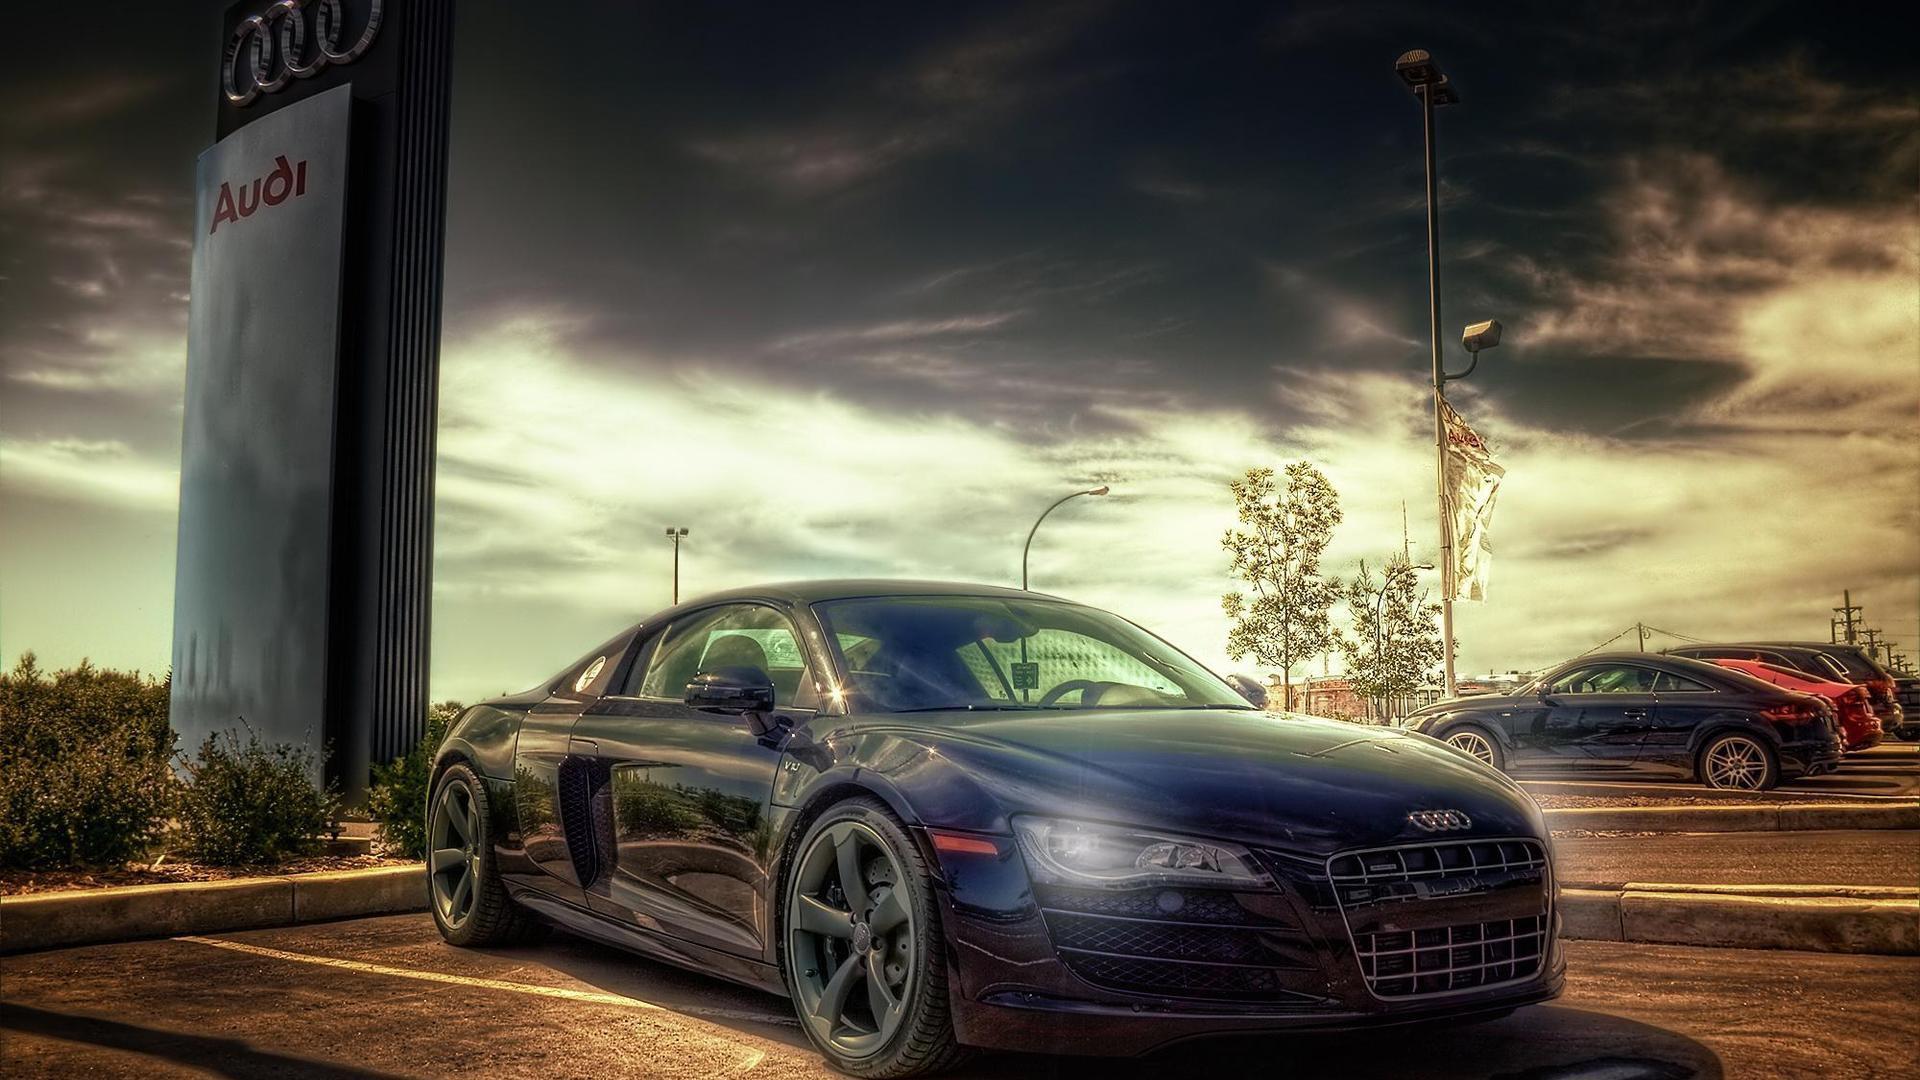 Cars Parking Hdr Photography Audi R8 V10 Wallpaper